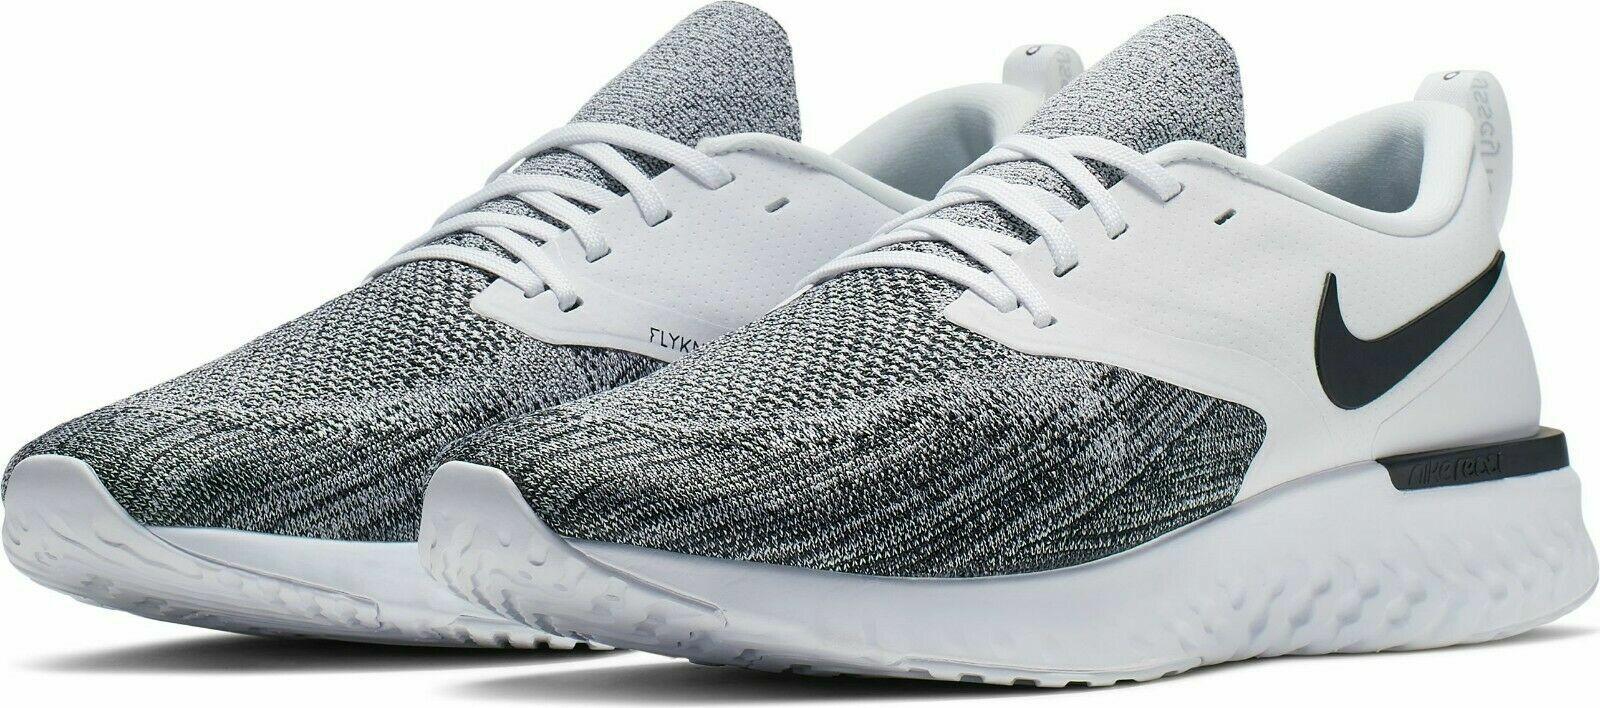 pretty nice 57521 a35da Nike Odyssey React 2 Flyknit Running Shoes Black White Oreo AH1015-100  Men's NEW